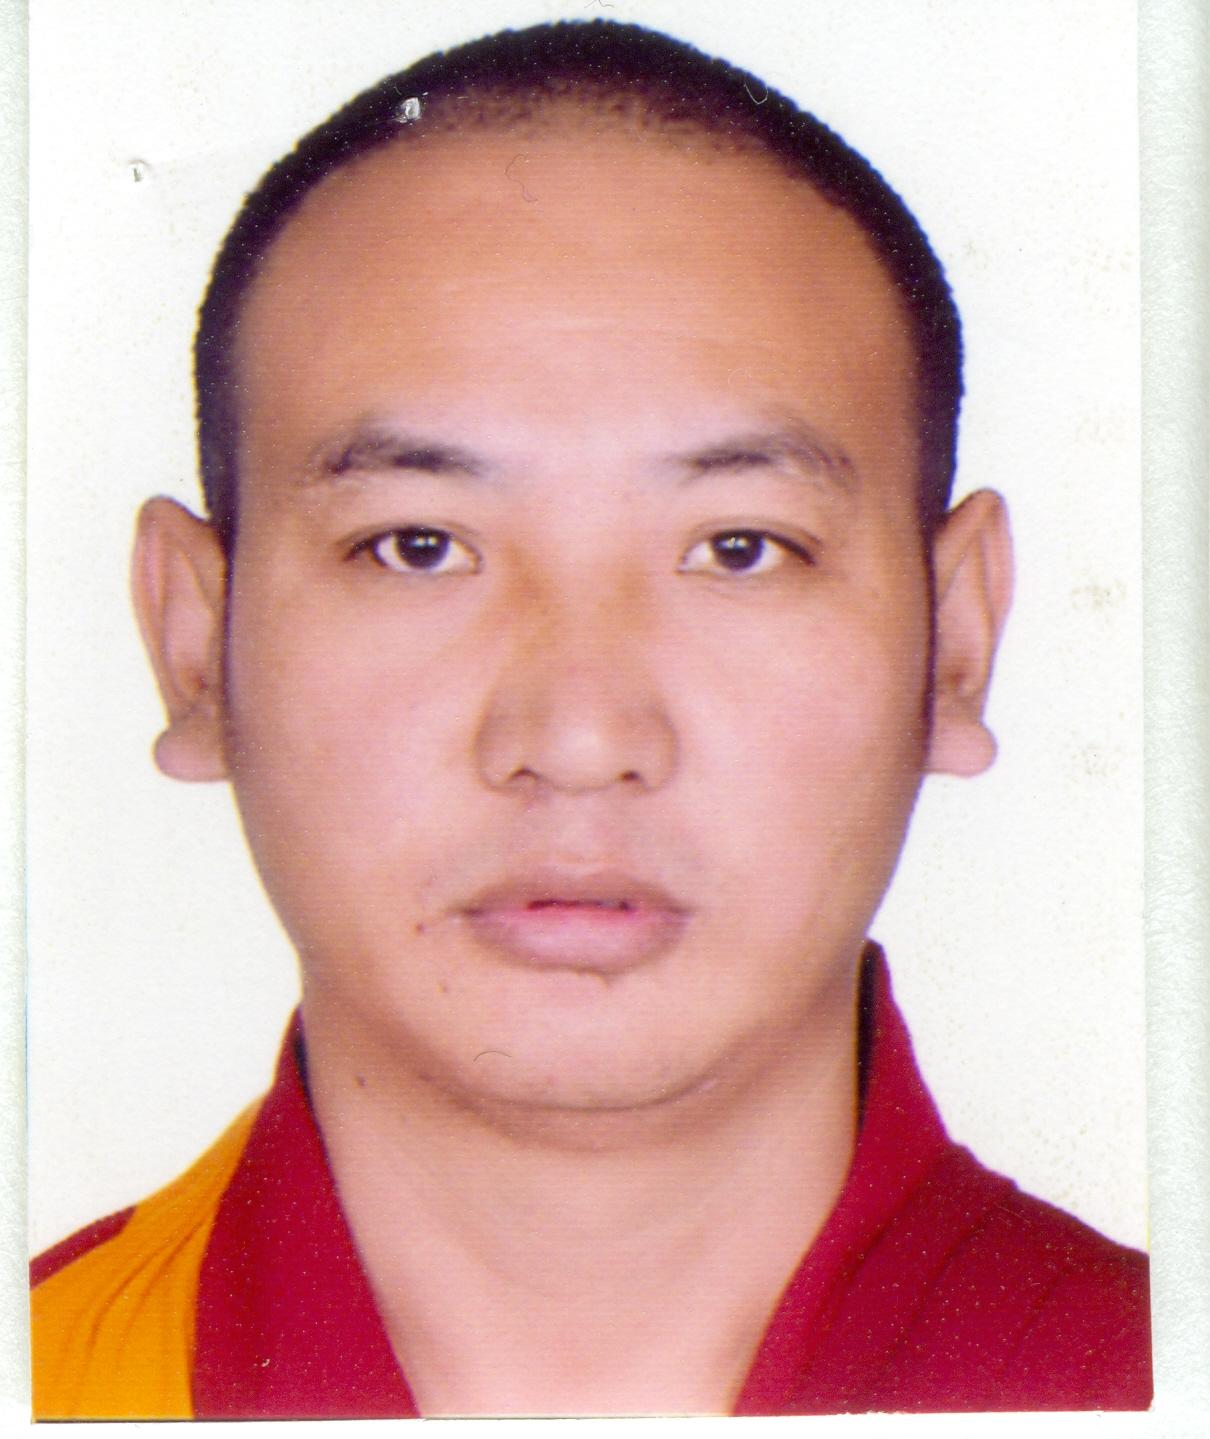 Lopon Thupten Gyaltsen